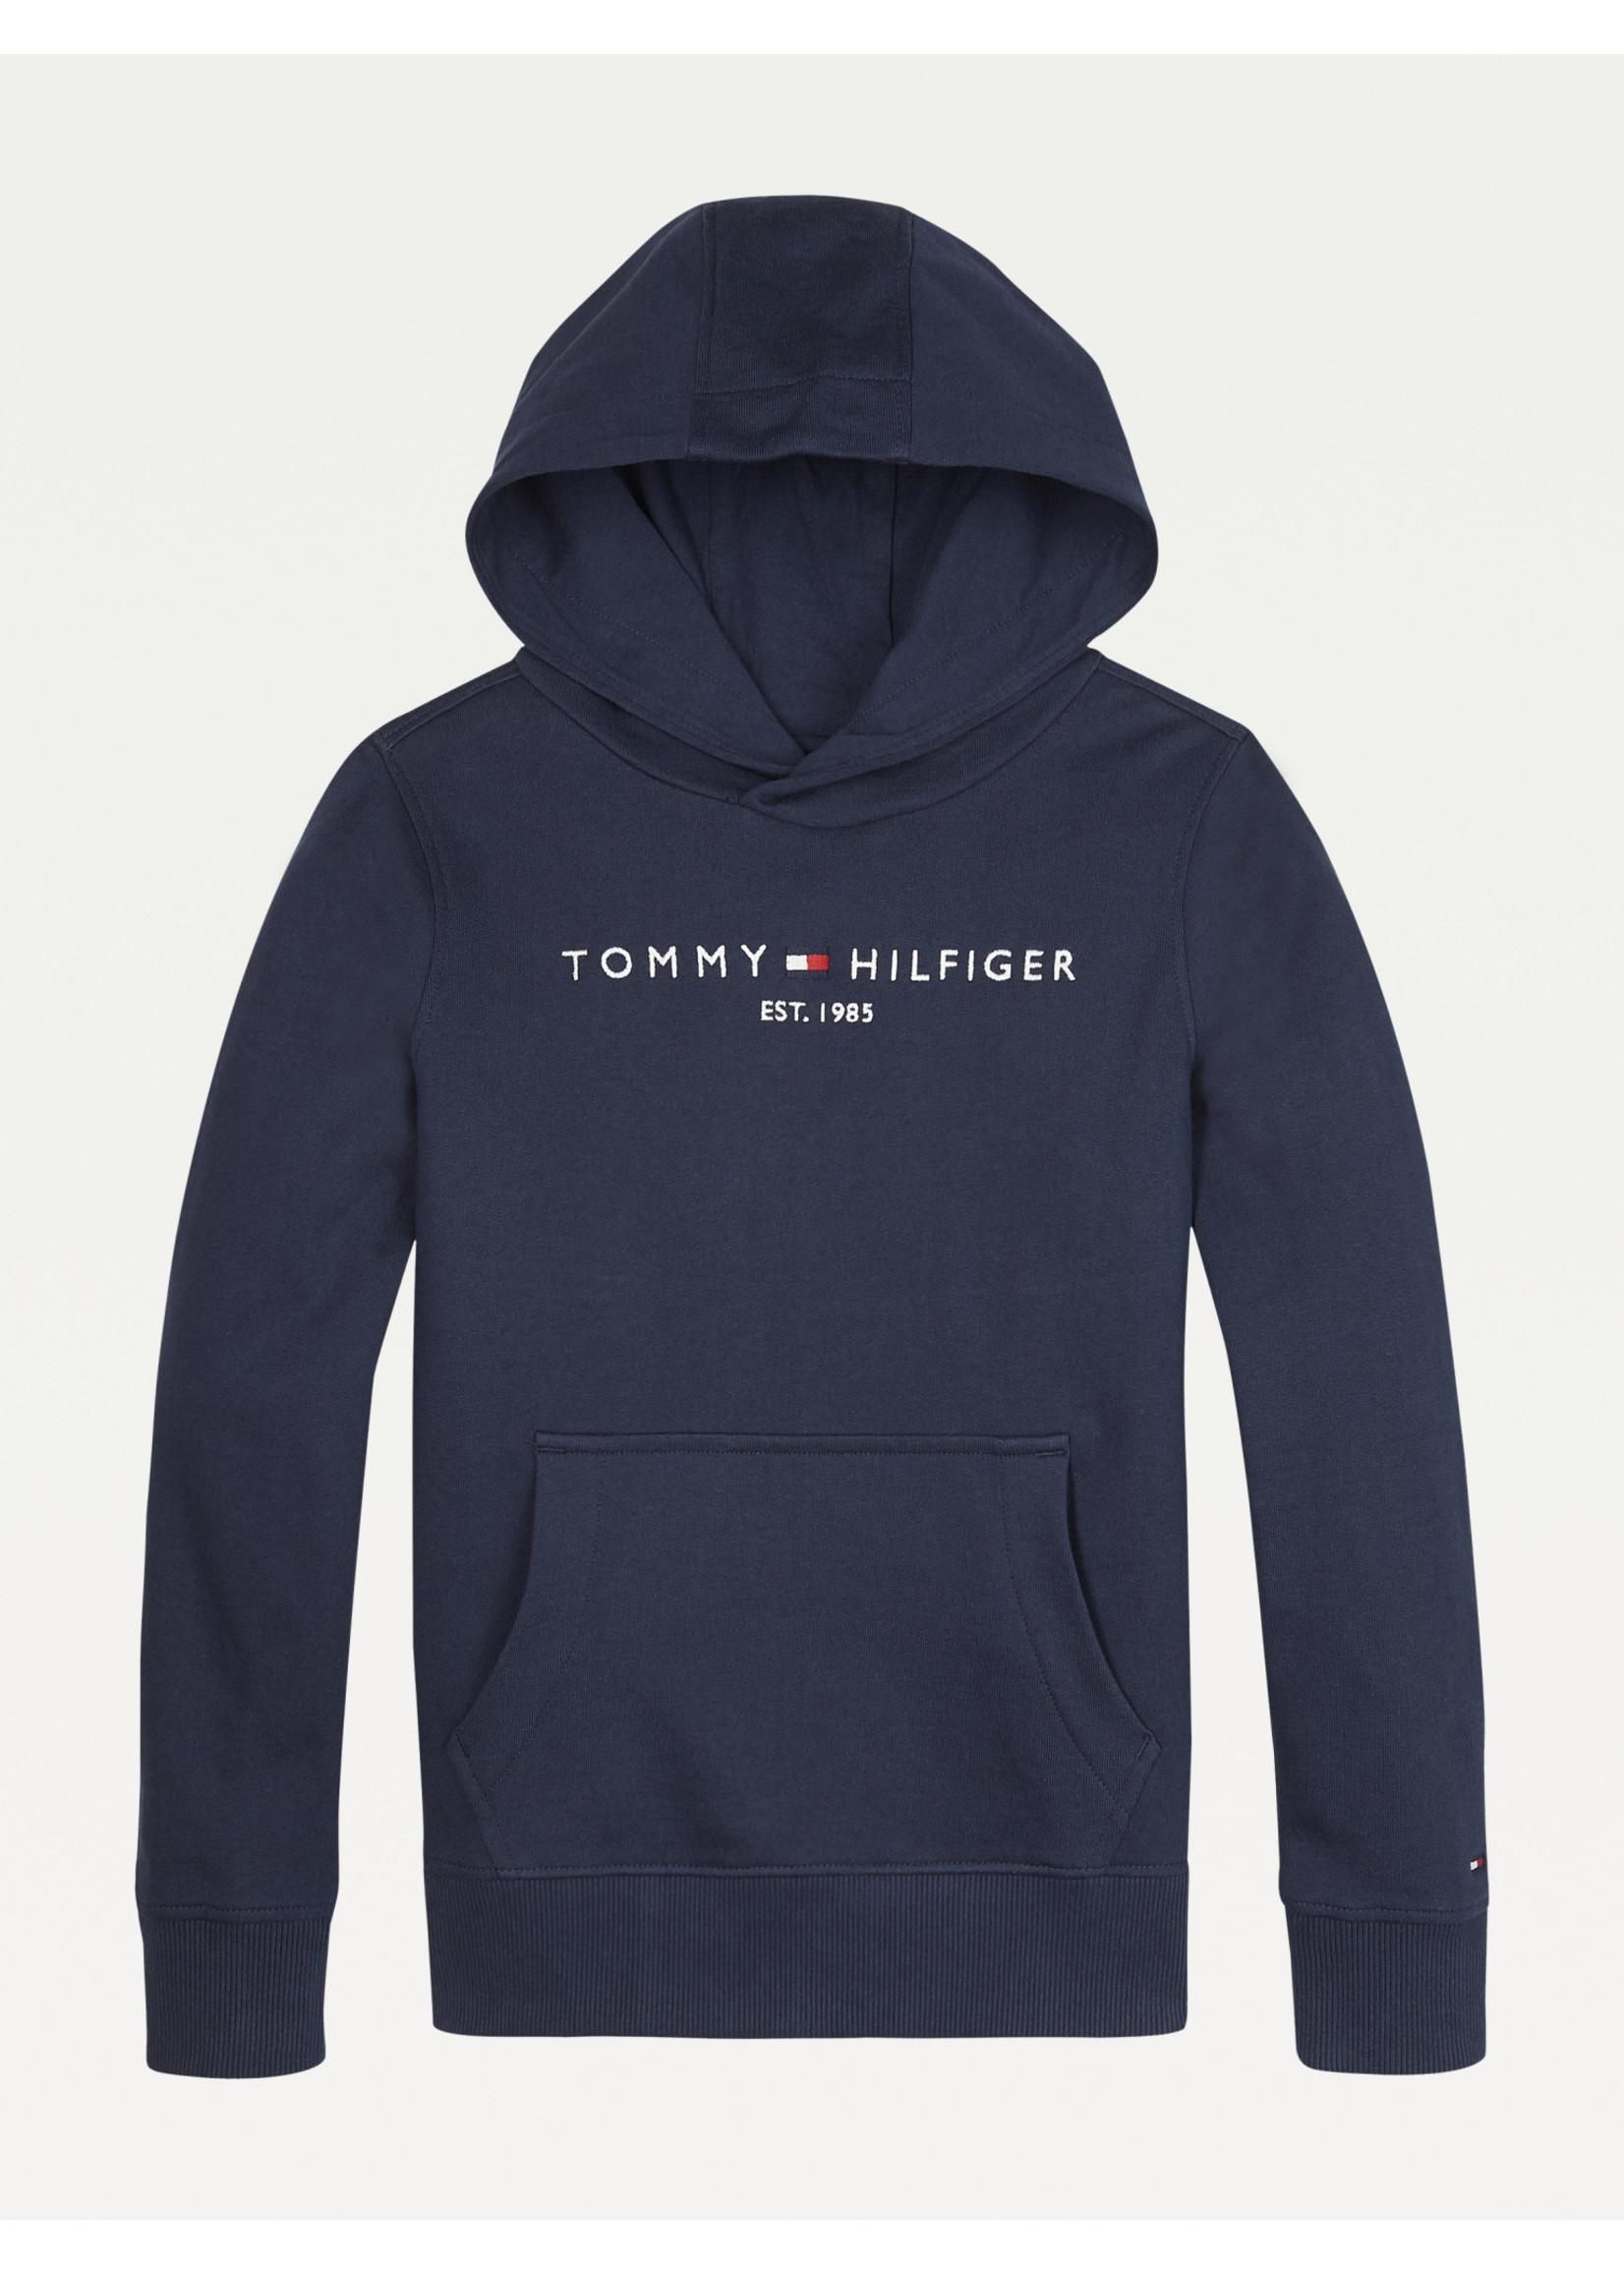 TOMMY HILFIGER TOMMY HILFIGER Hoodie essential twilight navy